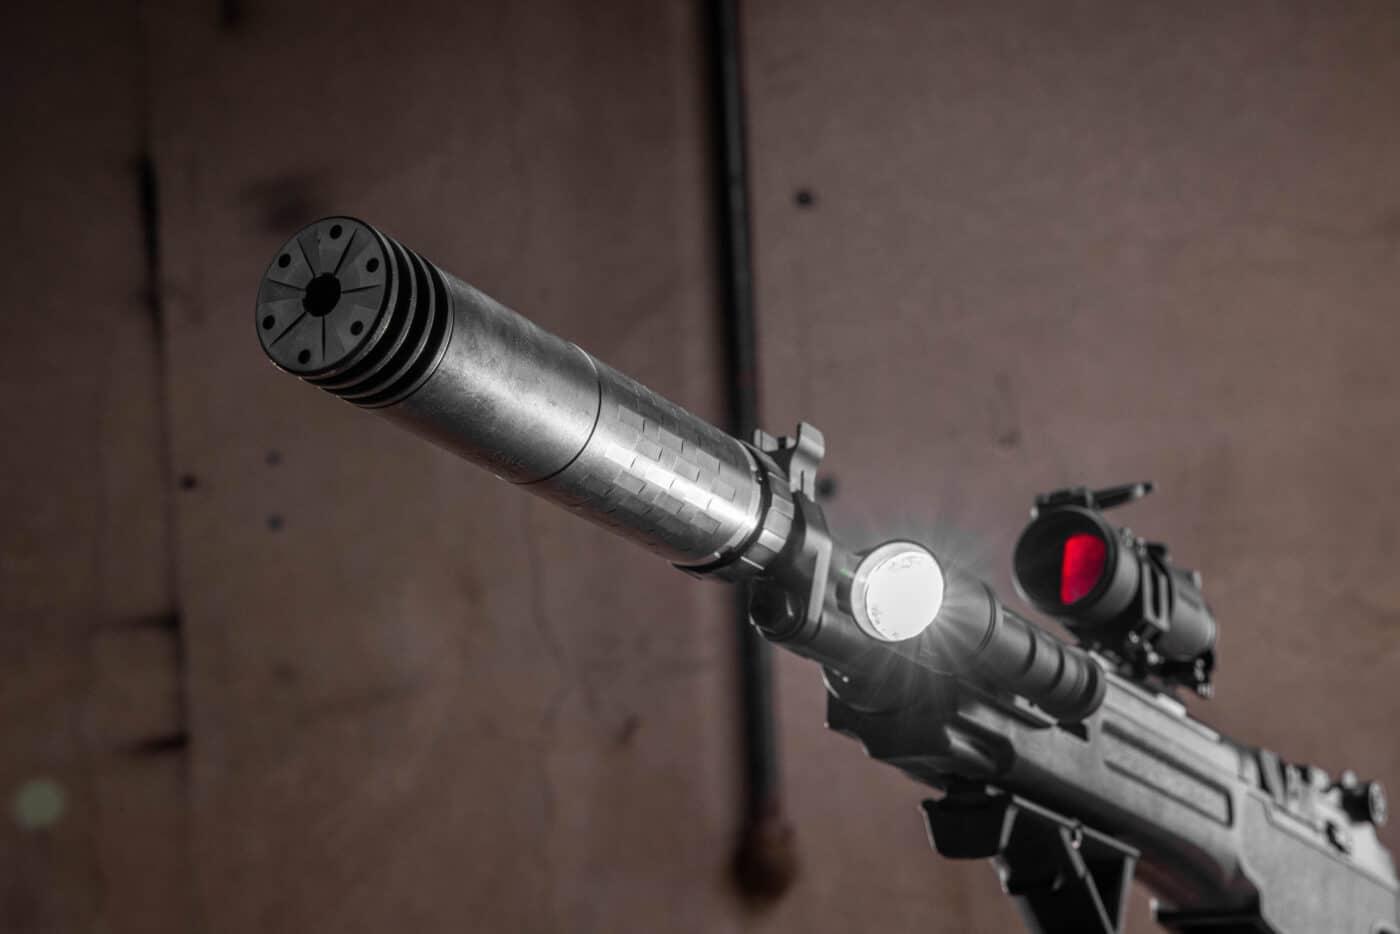 SilencerCo Omega 300 suppressor on an M1A rifle